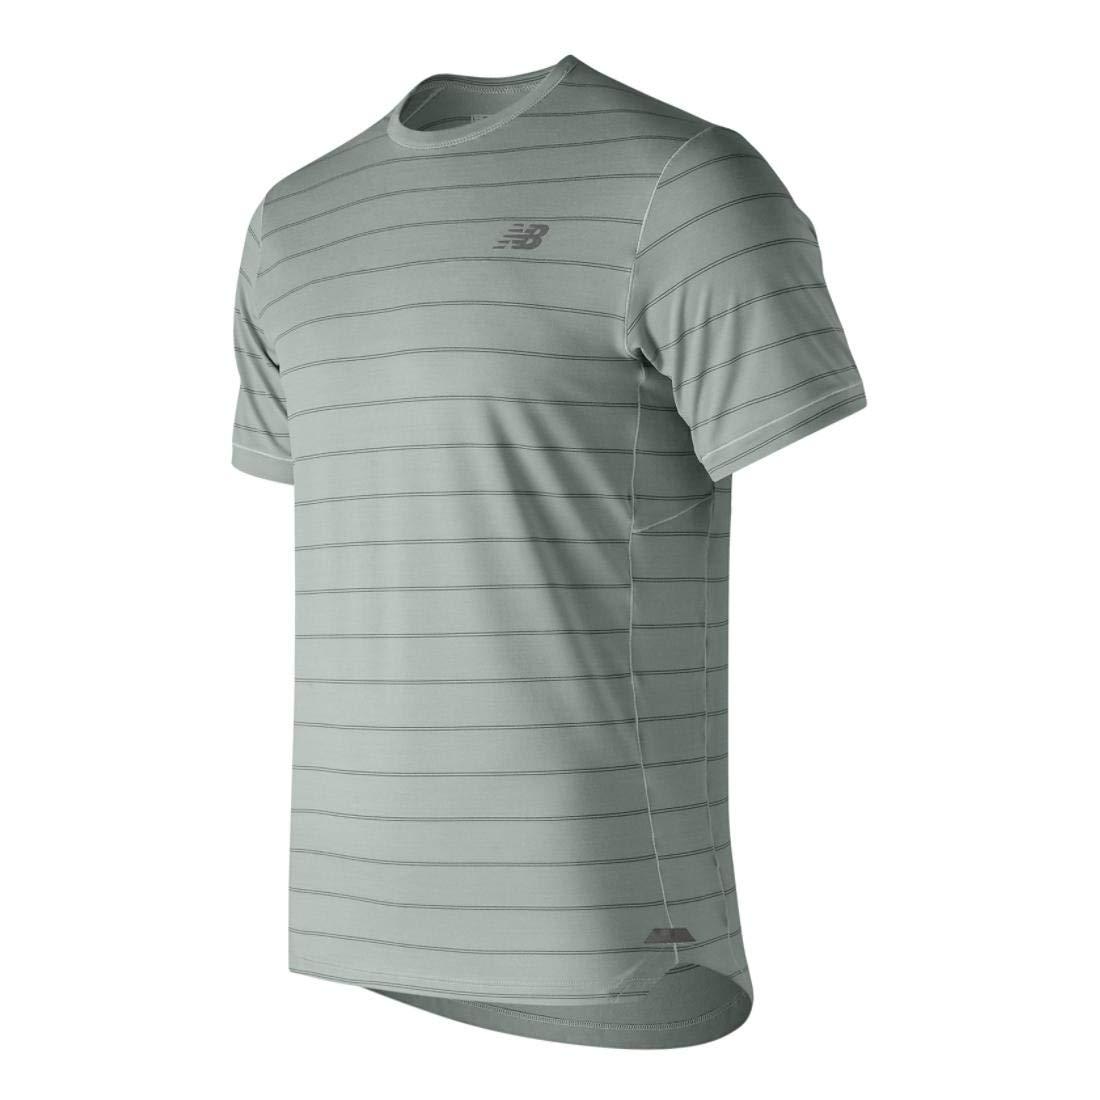 bb266ba8e24fe Amazon.com: New Balance Mens Seasonless Breathable Lightweight Short Sleeve  Running T-Shirt: Sports & Outdoors